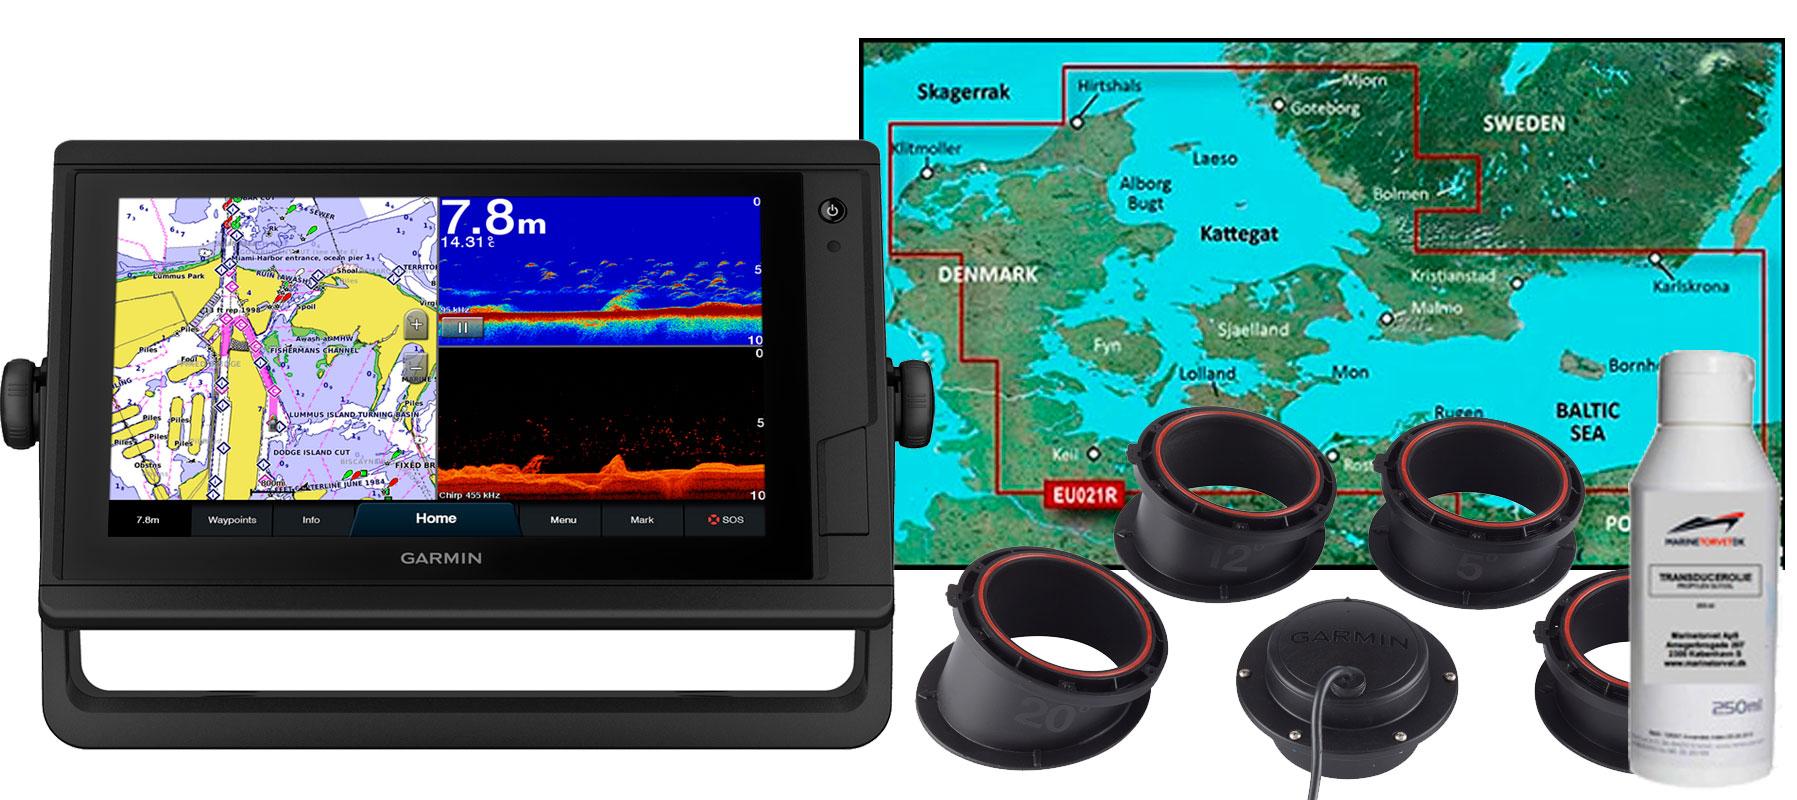 Garmin GPSmap 922xs PLUS, HXEU021R og GT15M-IH